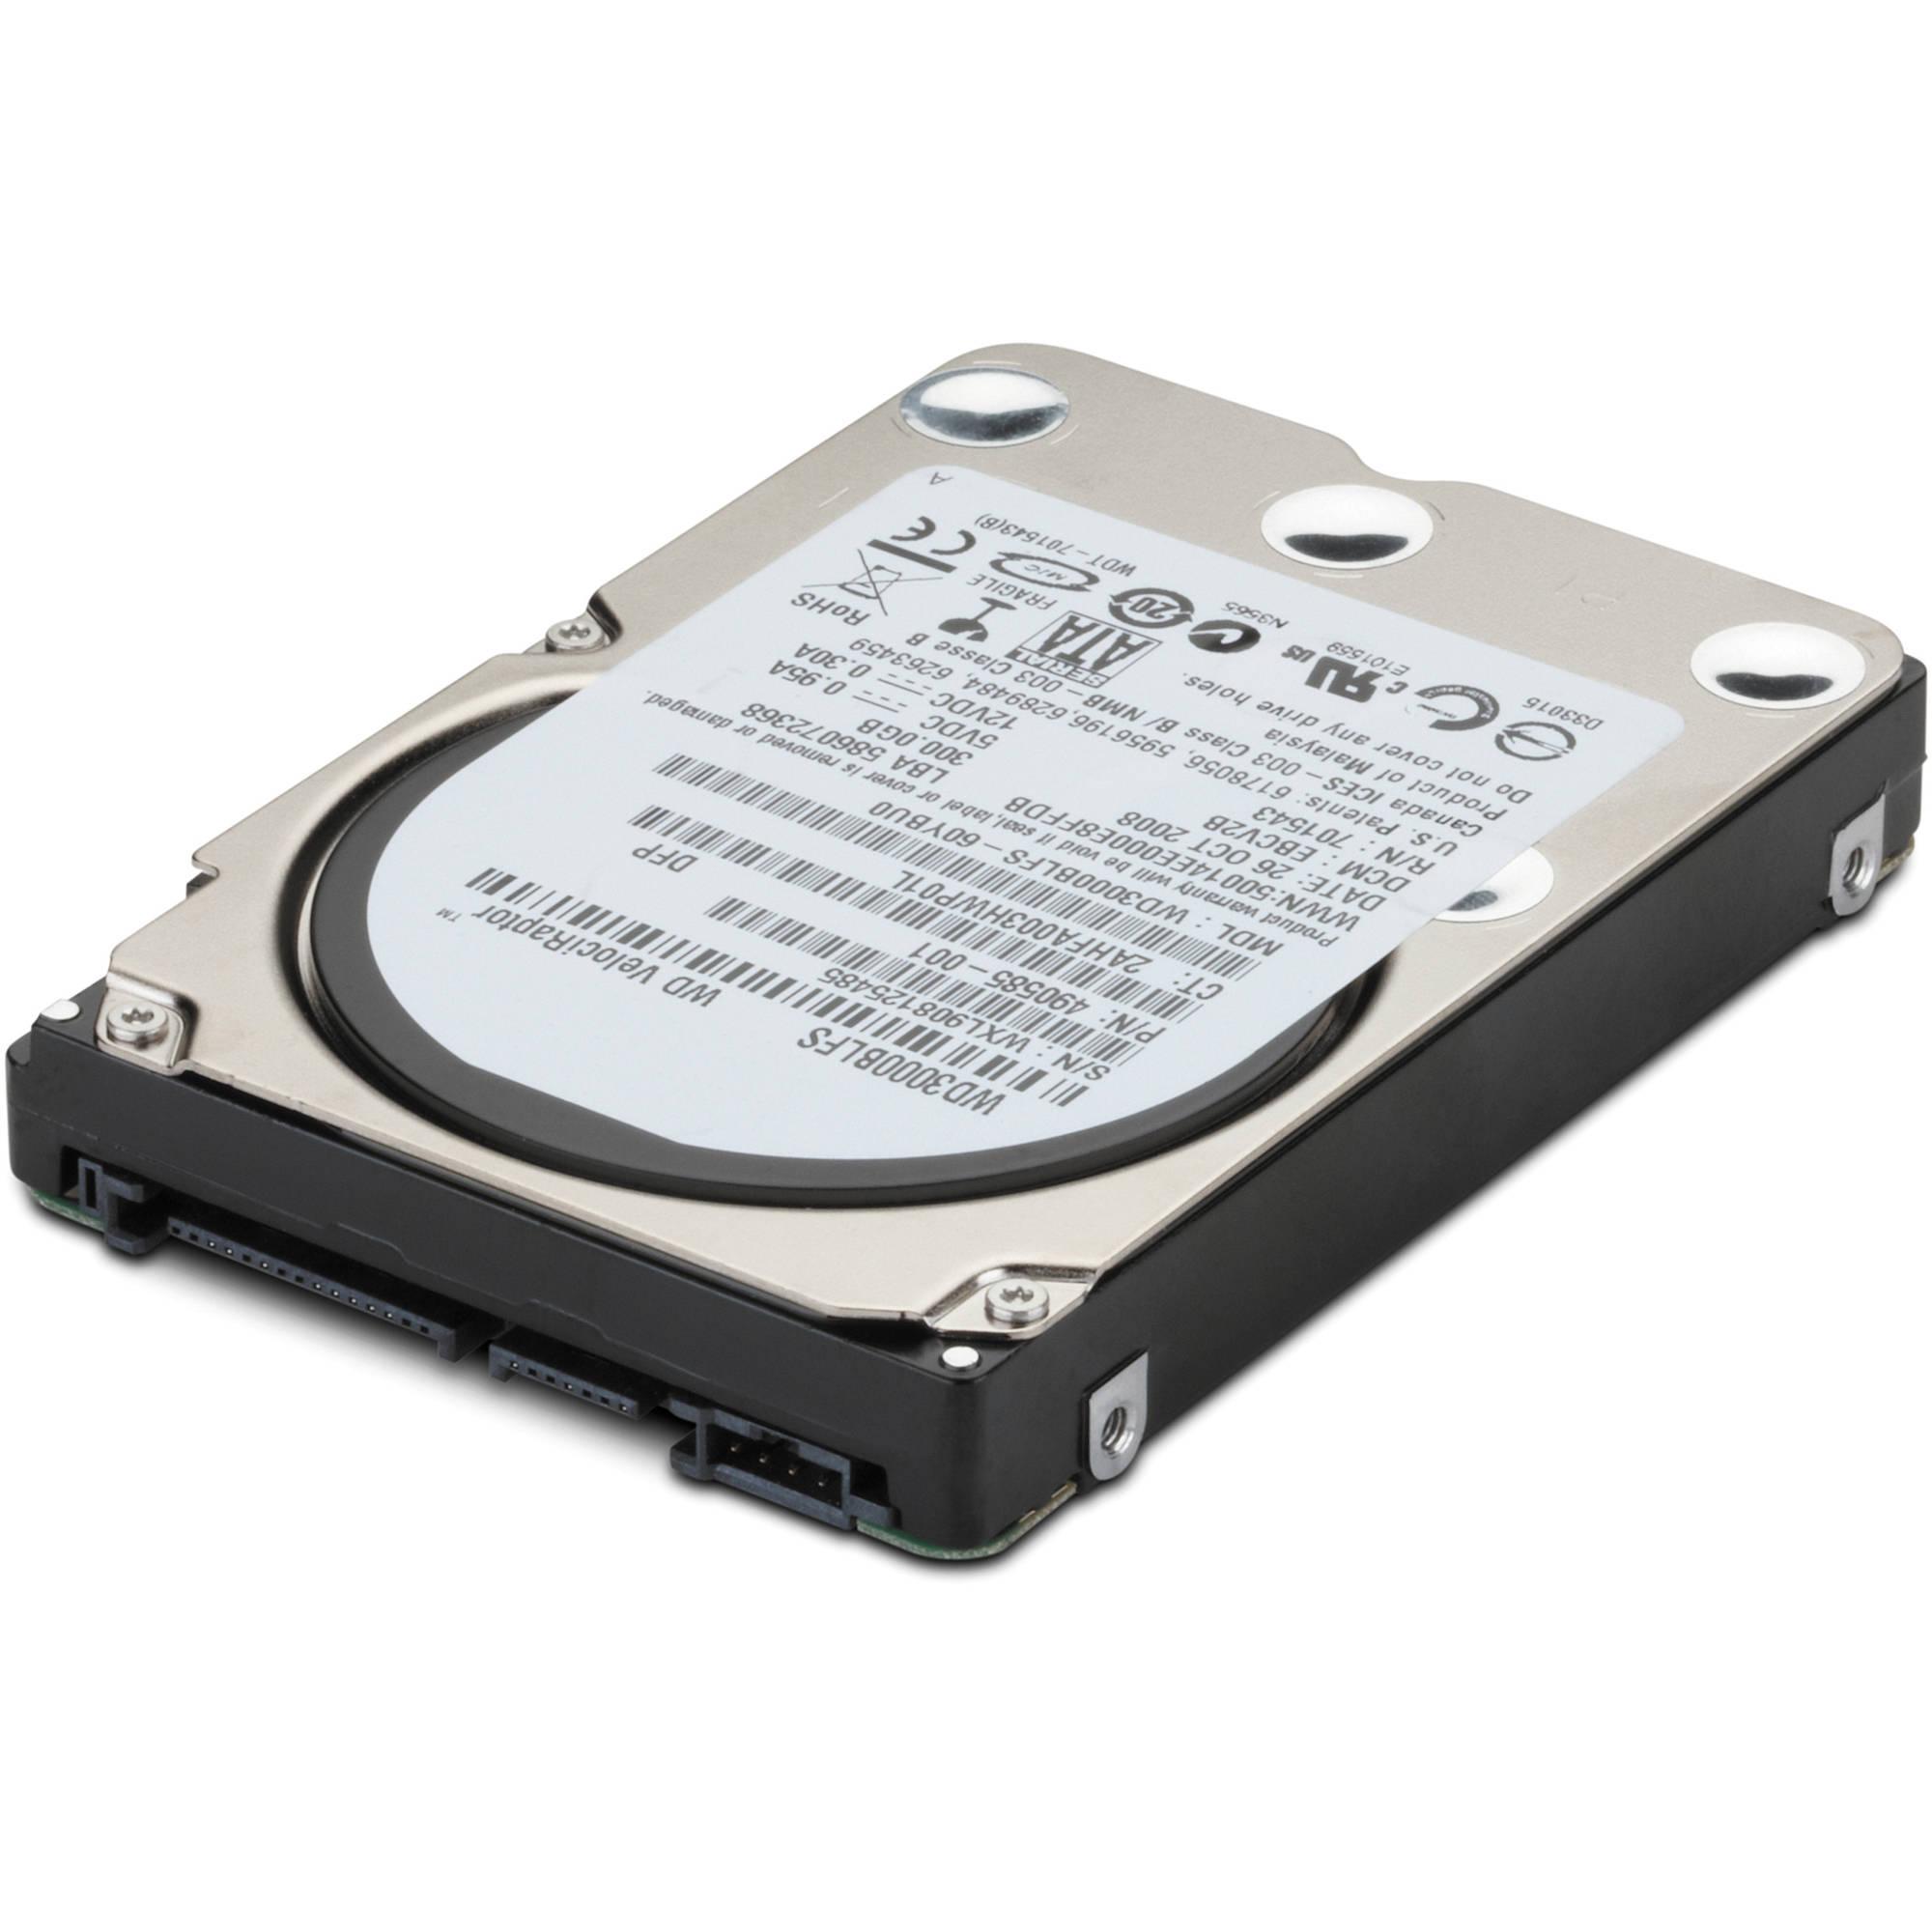 HP 1.2TB SAS Small Form Factor Hard Drive (E2P04AA) E2P04AA B&H